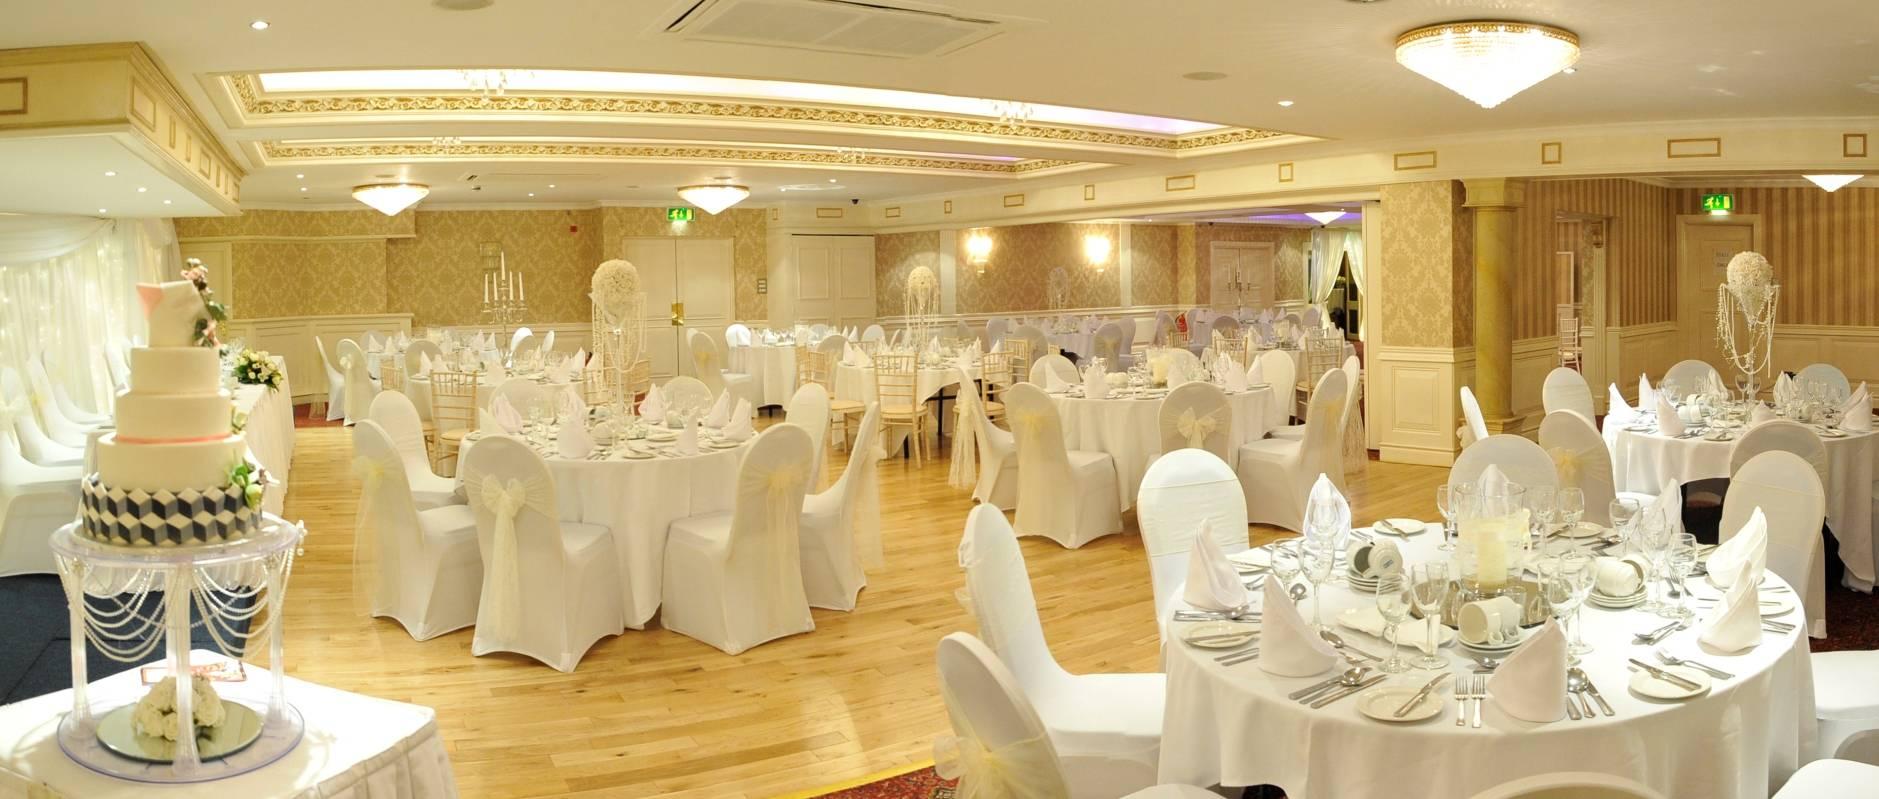 Wedding Venue Bushtown Hotel Coleraine